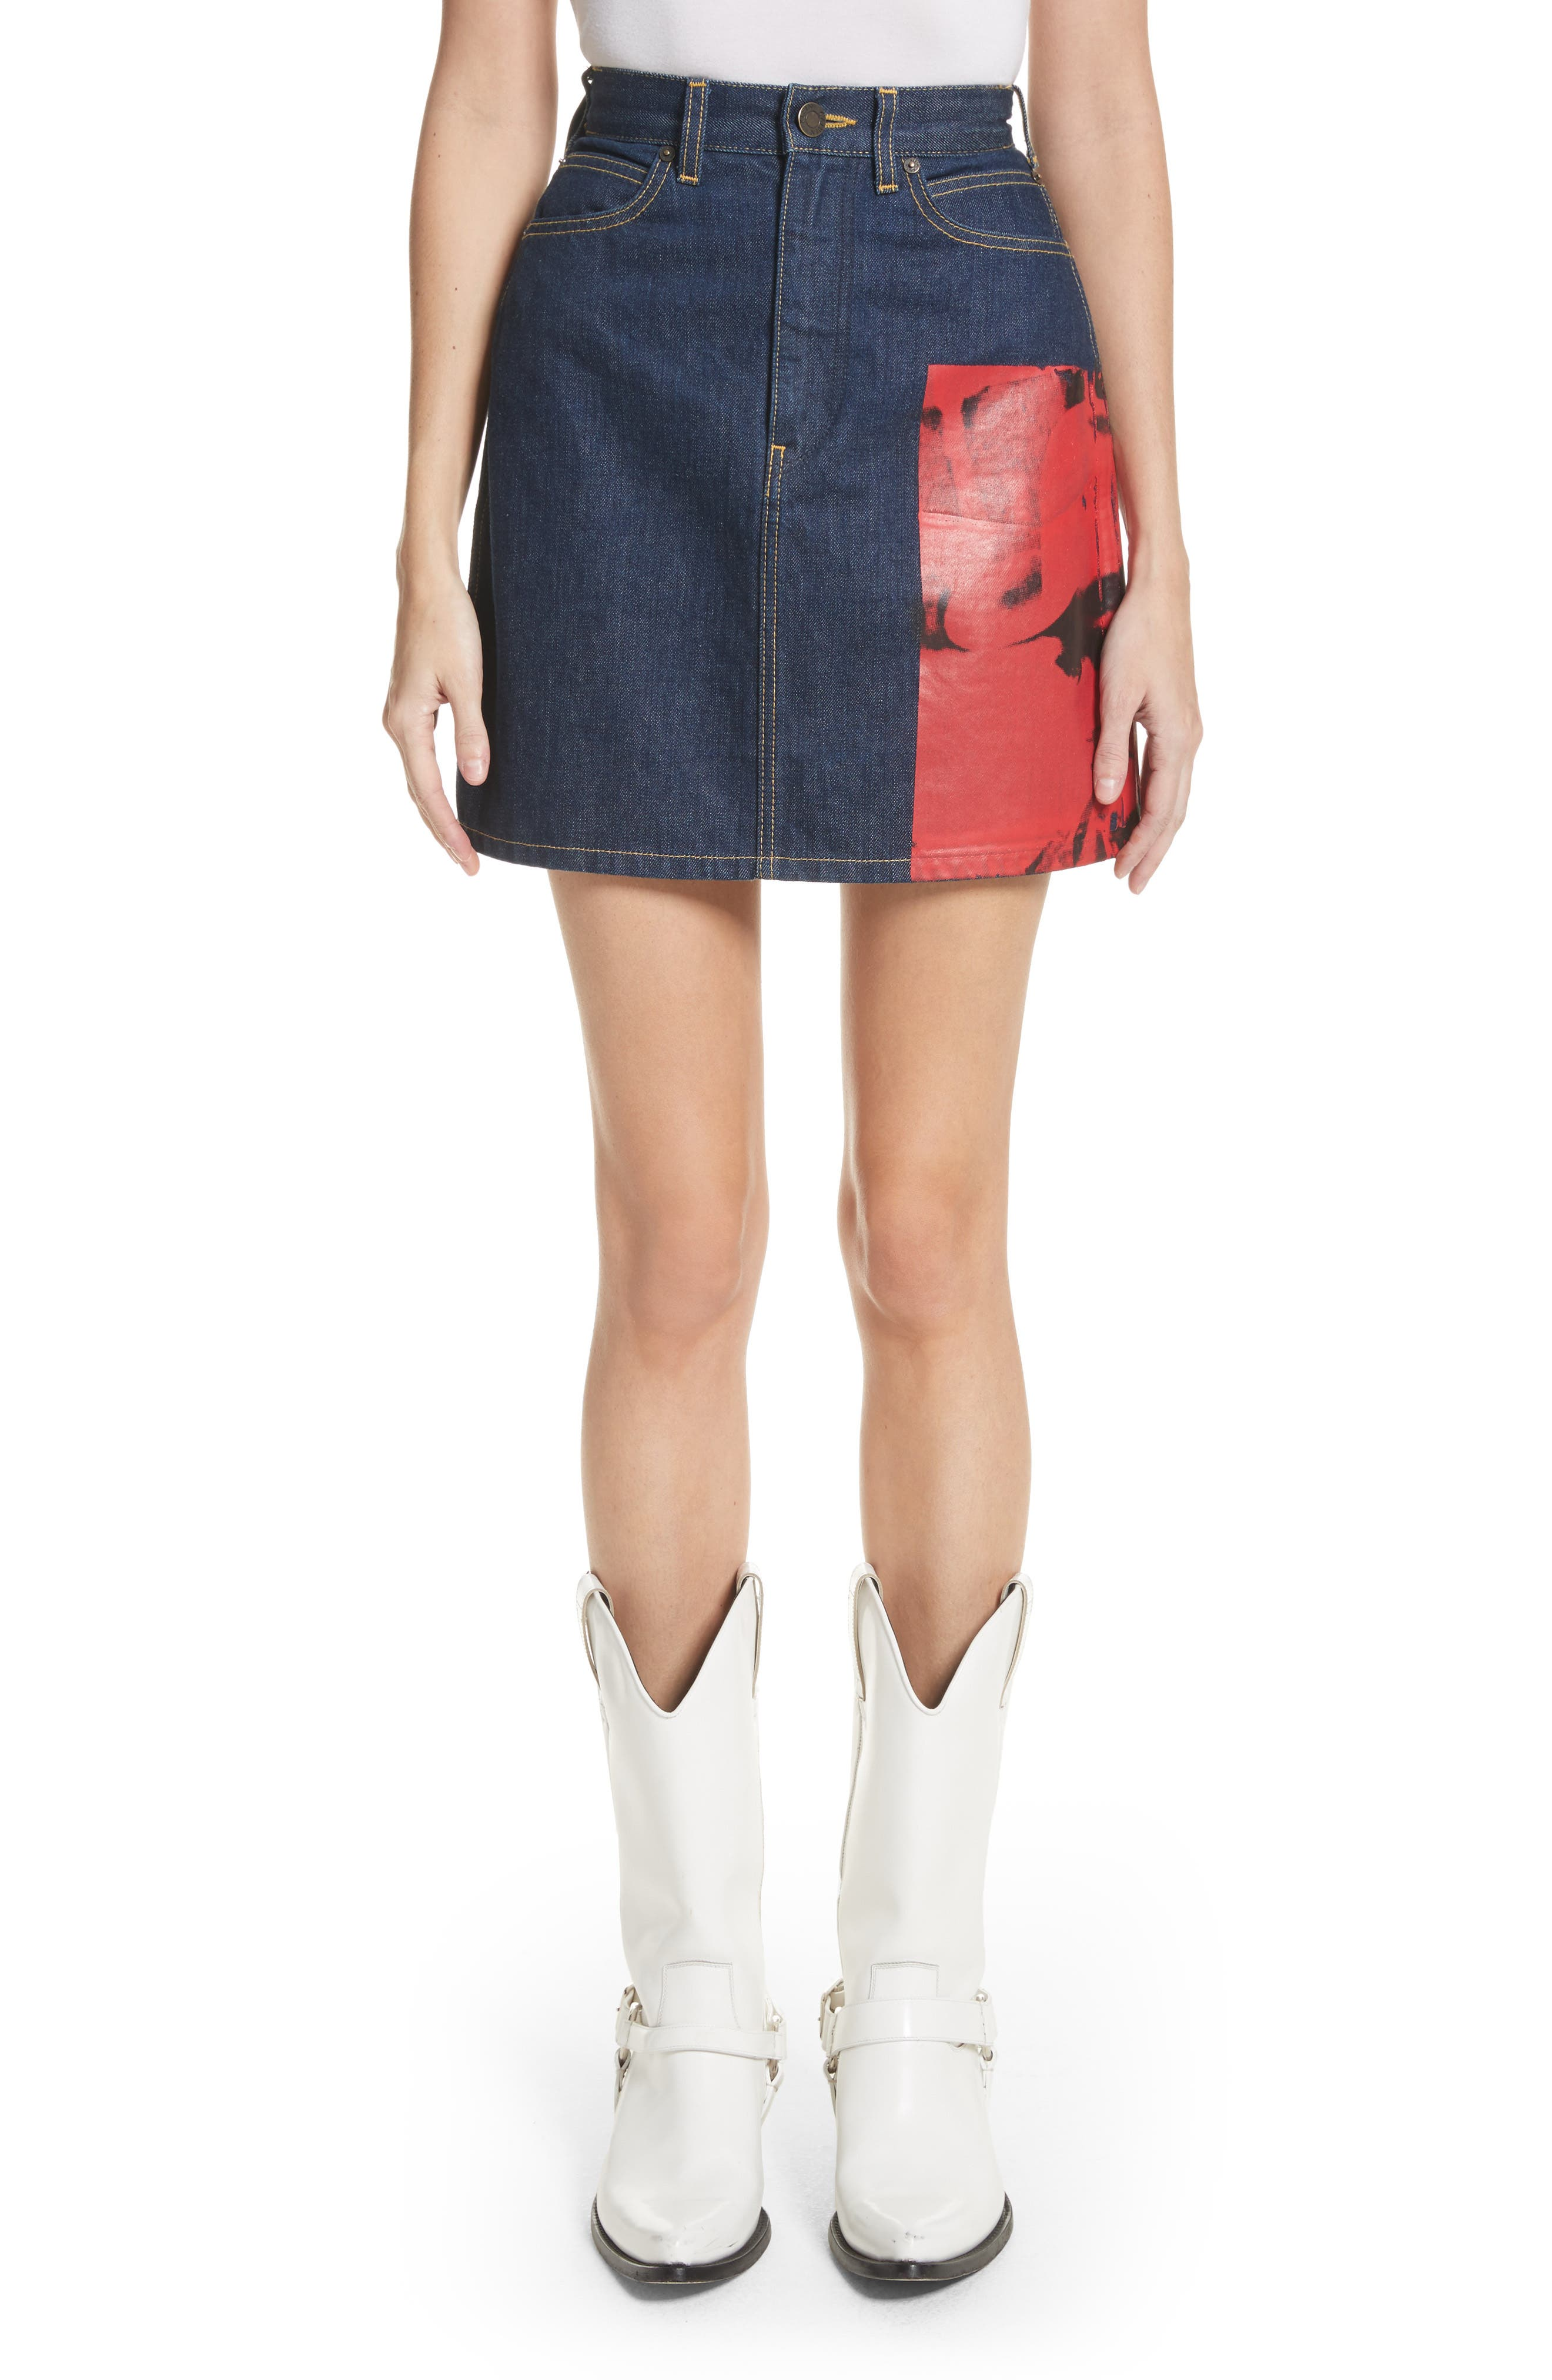 Alternate Image 1 Selected - CALVIN KLEIN 205W39NYC x Andy Warhol Foundation Dennis Hopper Denim Skirt